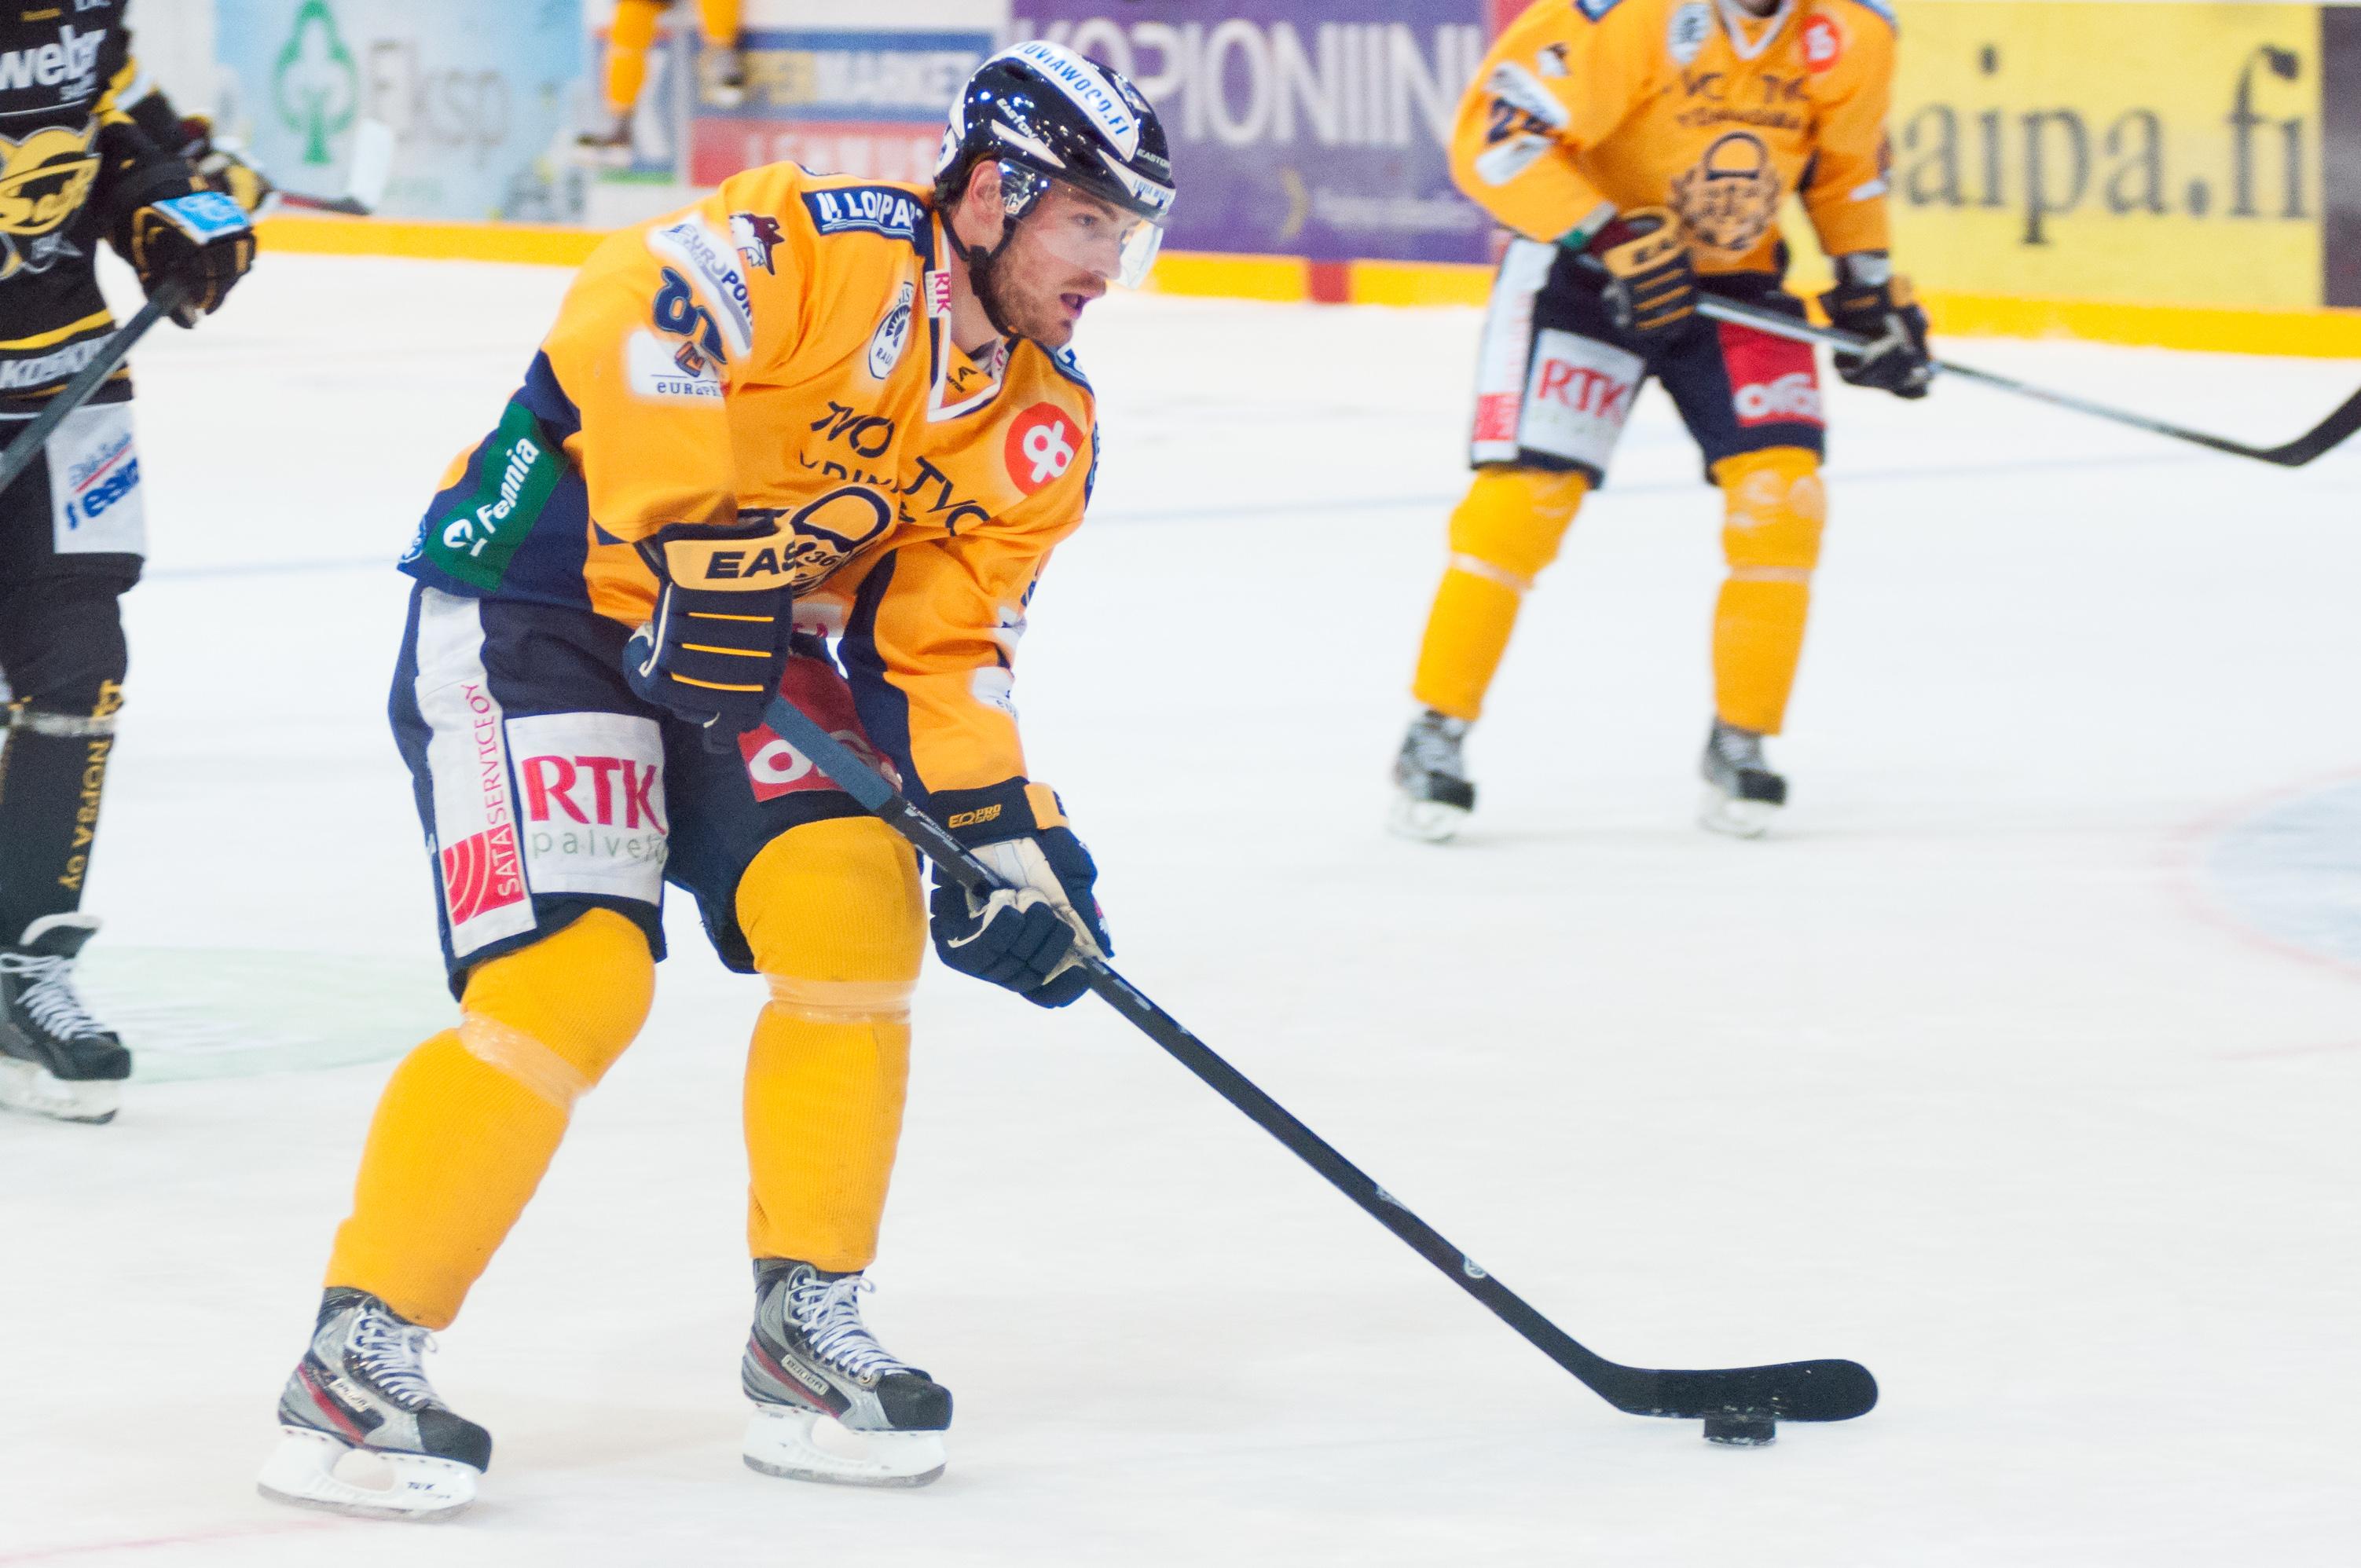 Mikkel Boedker Photo 1